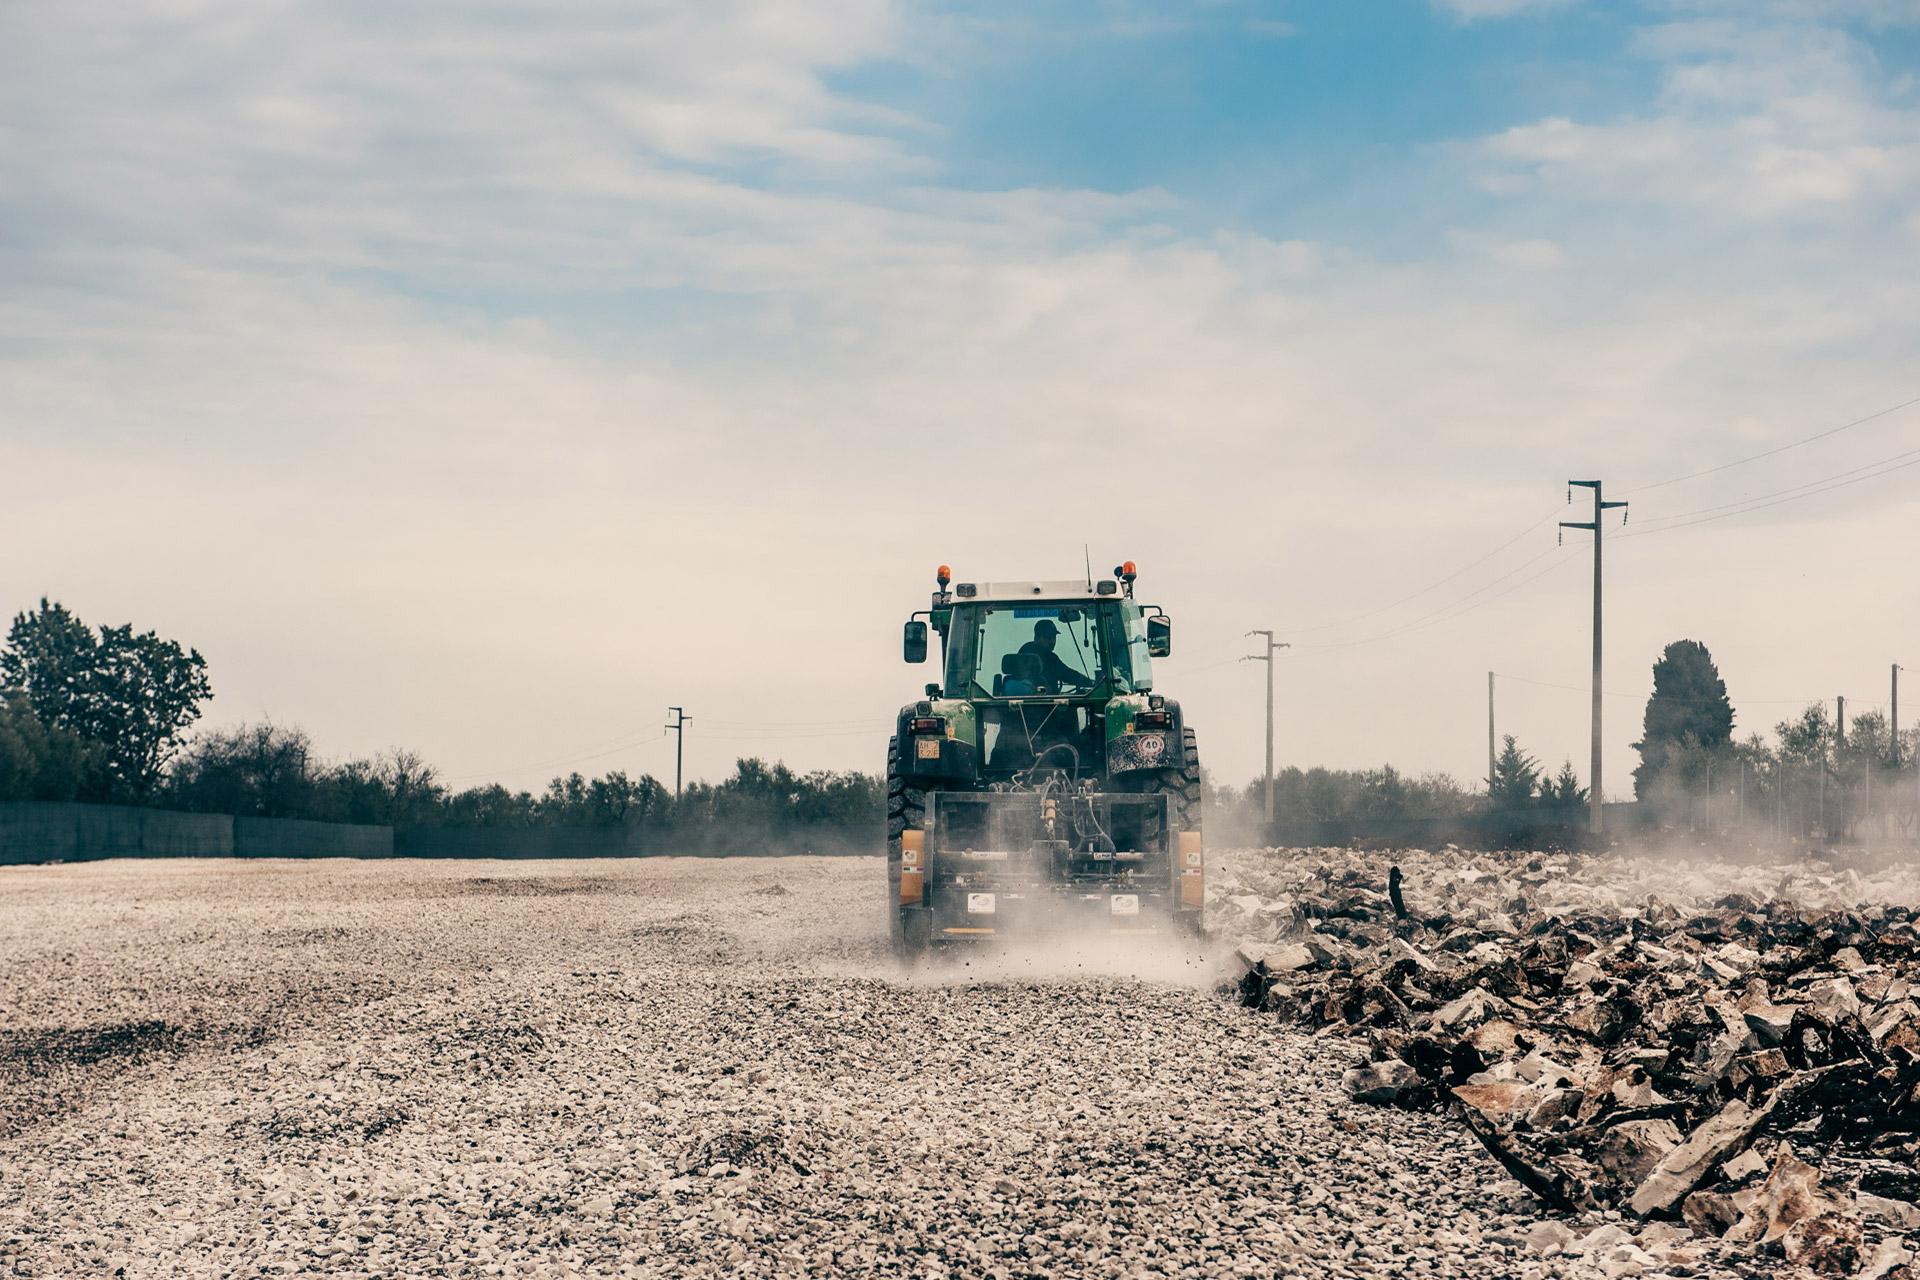 frantumatrice di sassi-stones crusher-macchine agricole e forestali-italy